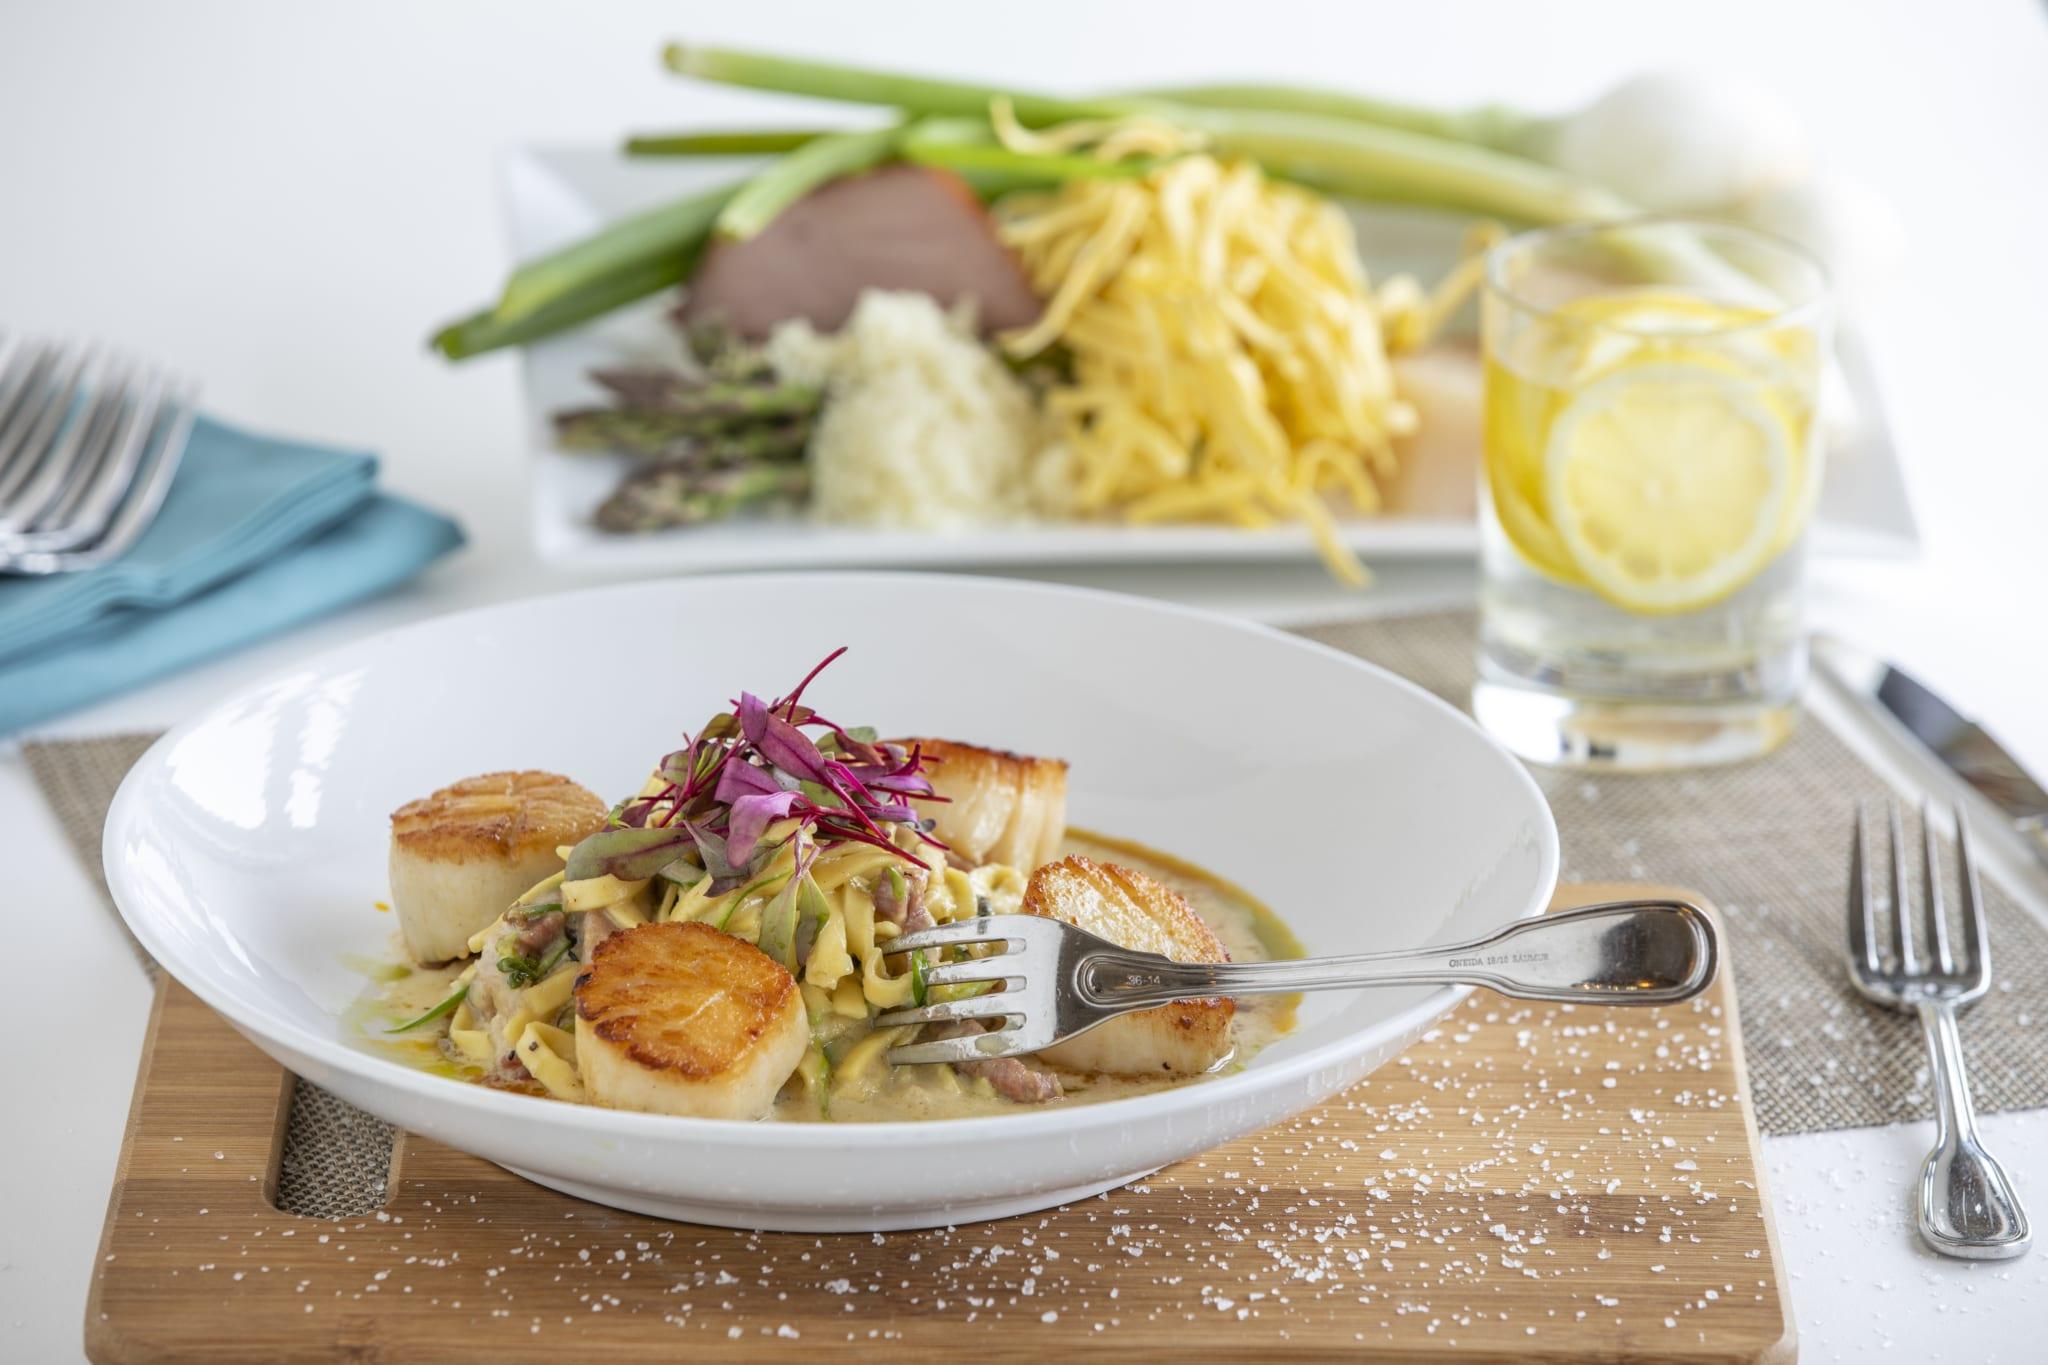 Restaurant scallops dining arrangement.